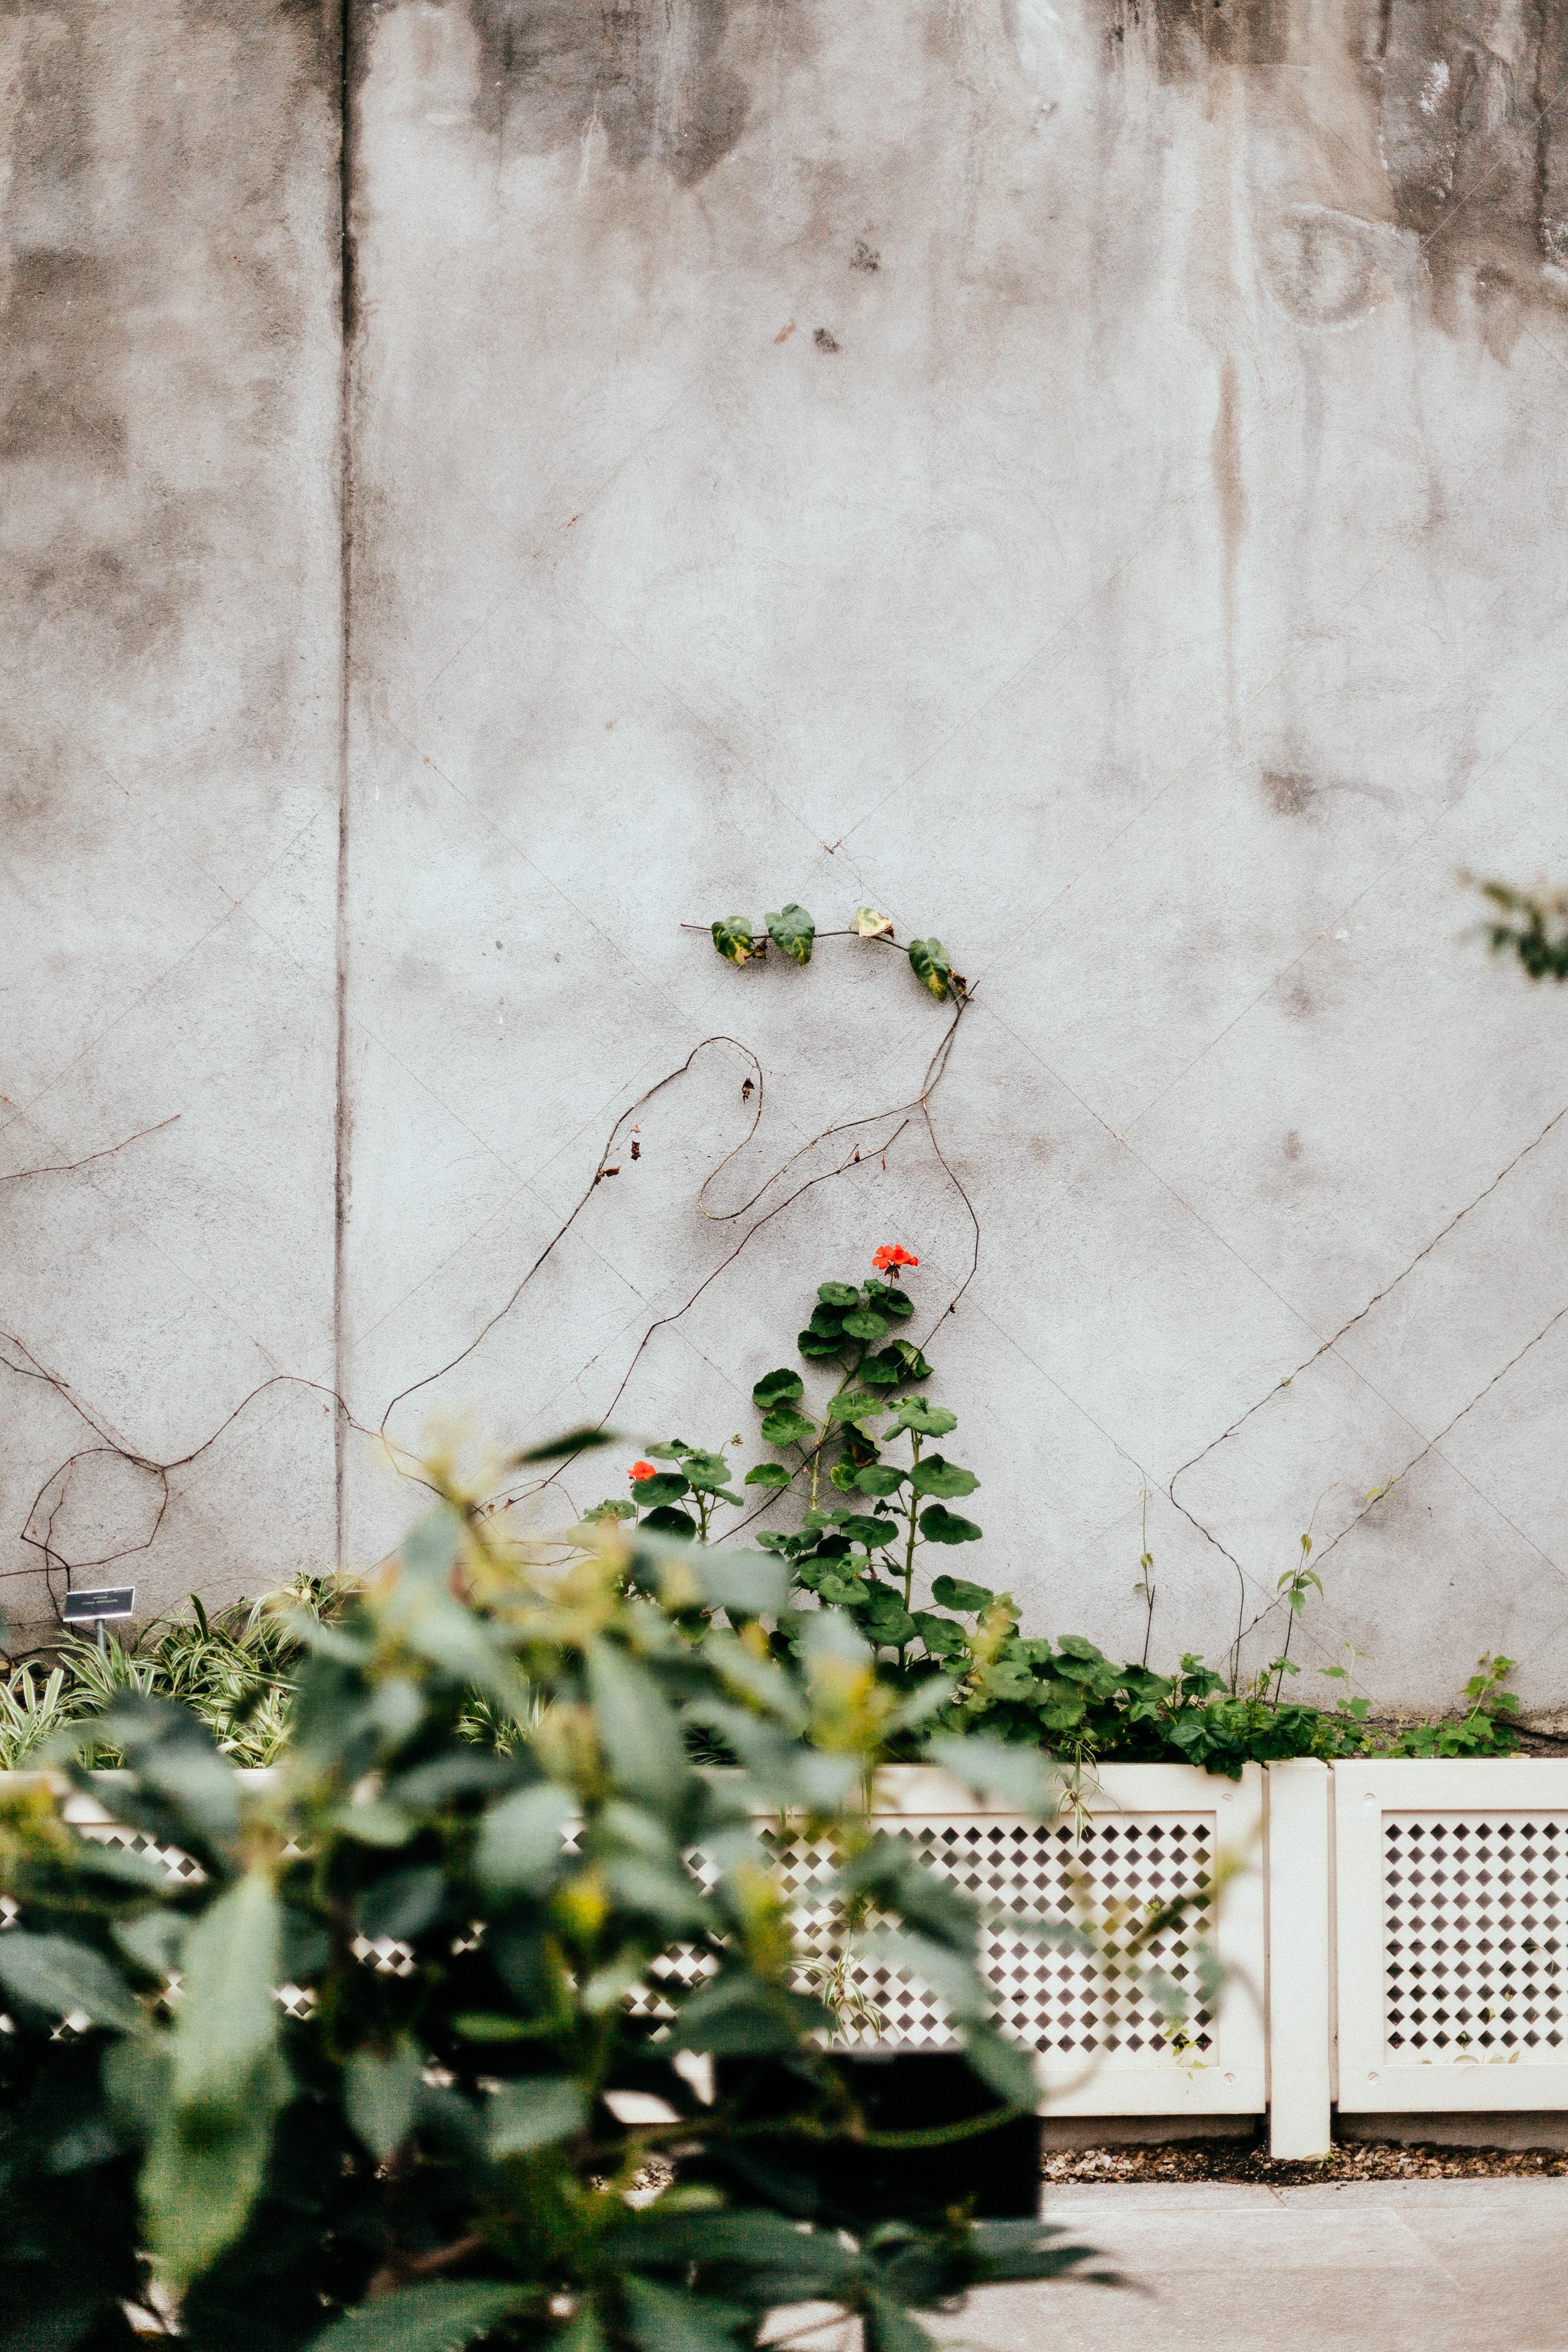 green vine plant on white concrete wall